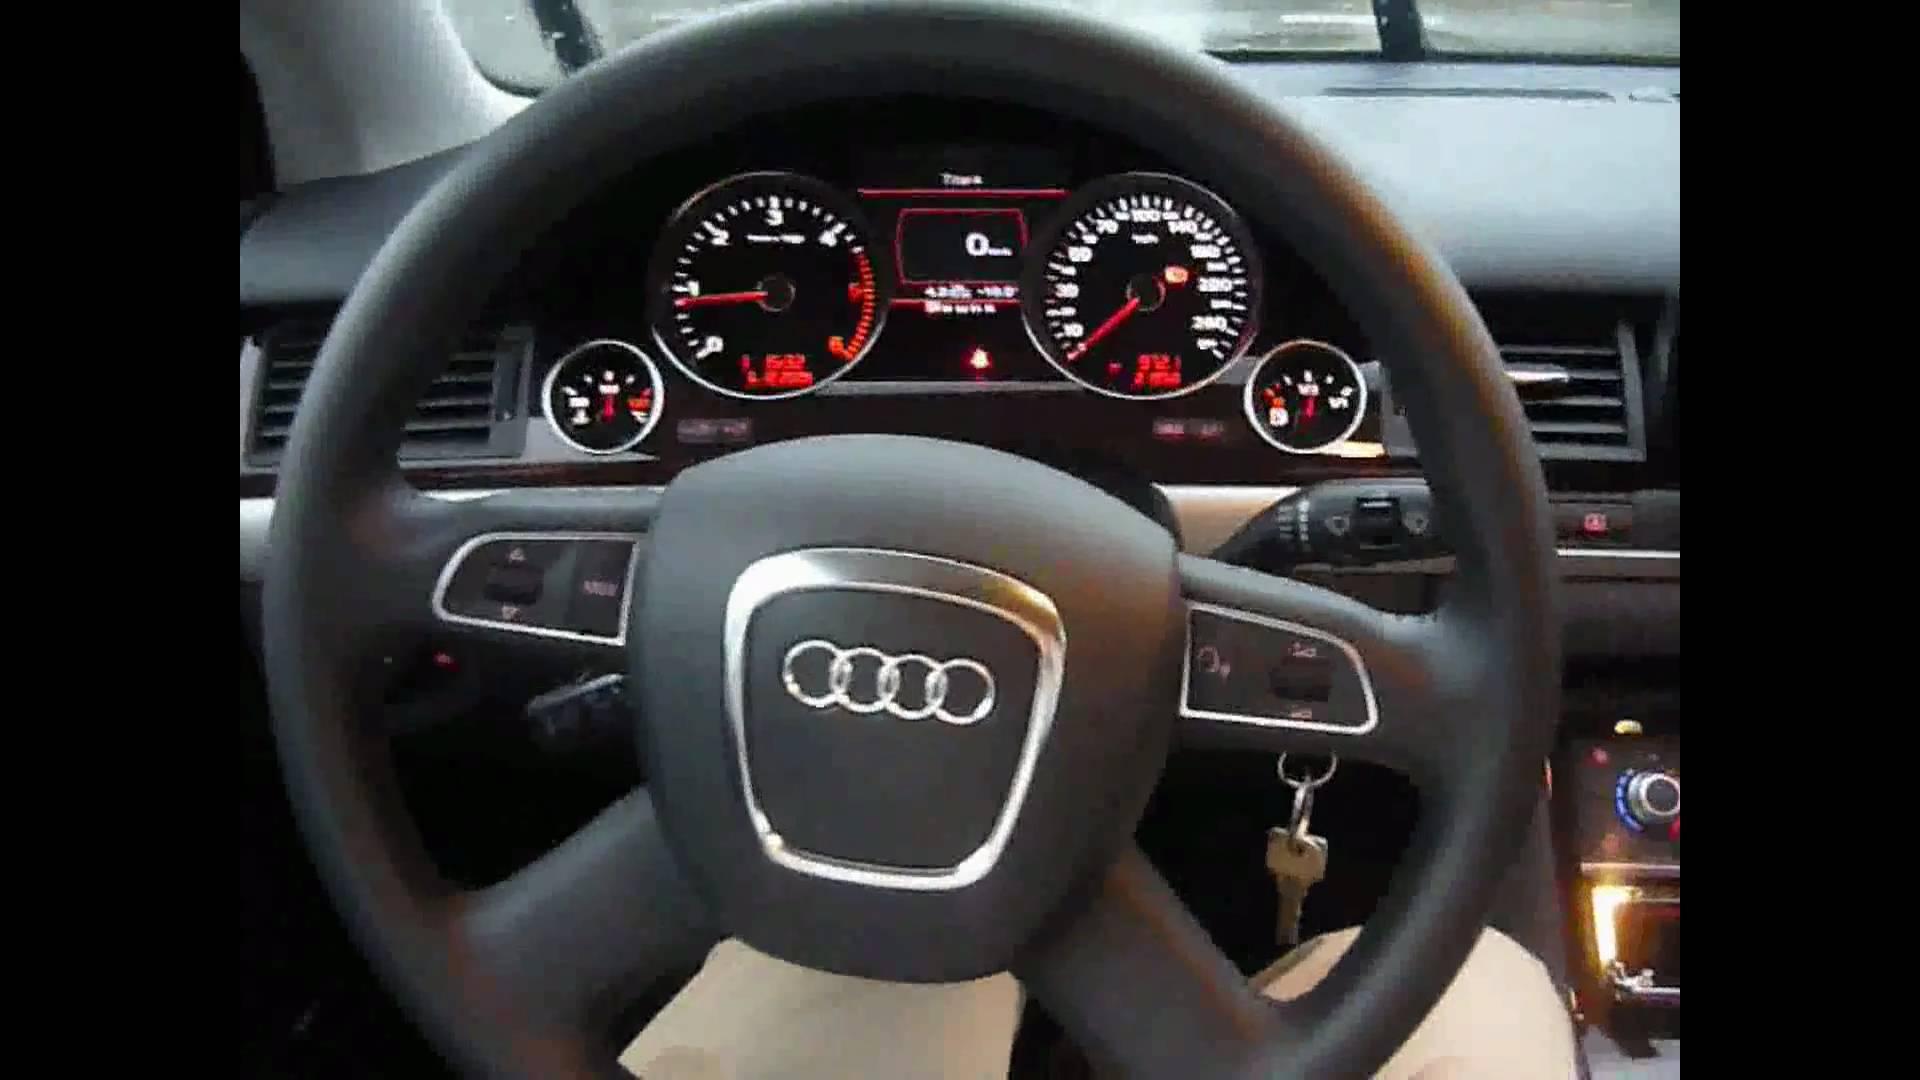 Audi A8 II (D3) Restyling 2 2007 - 2010 Sedan #2